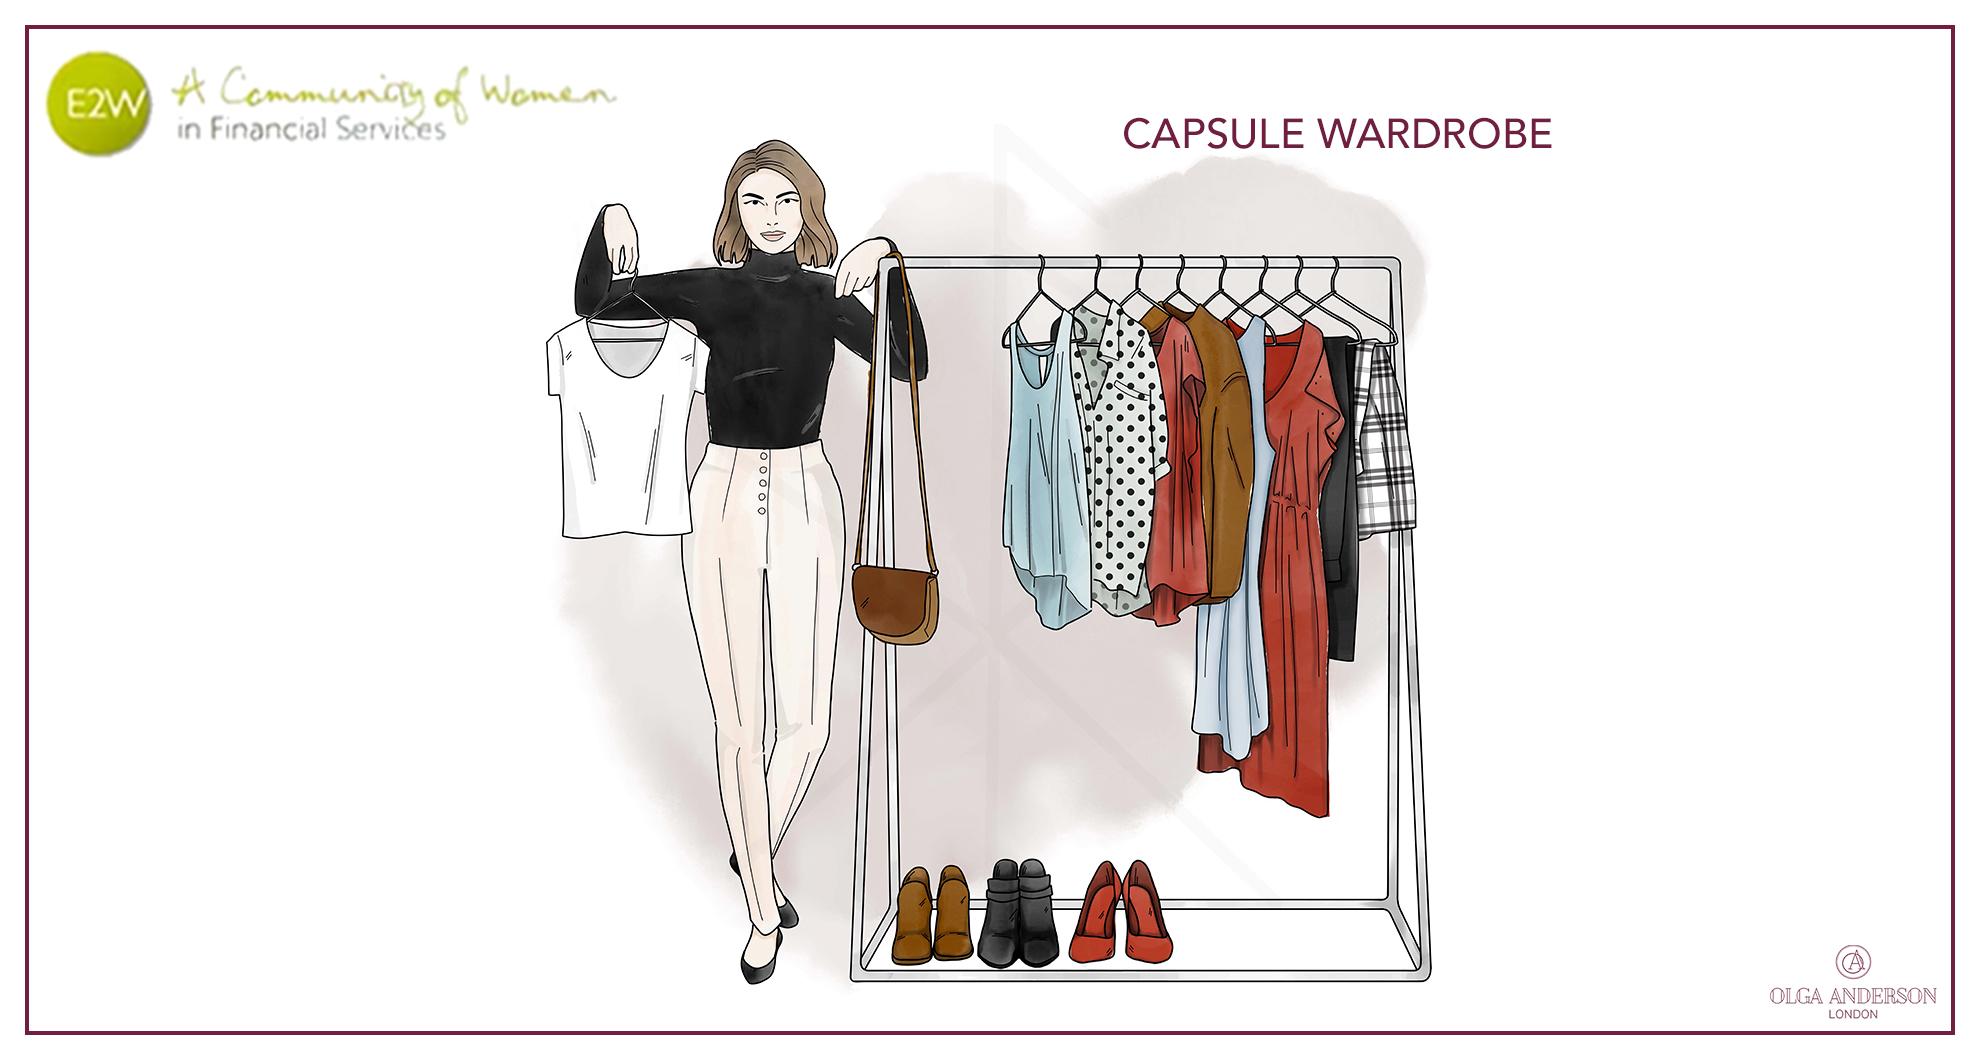 Olga Anderson - How to Master a Capsule Wardrobe